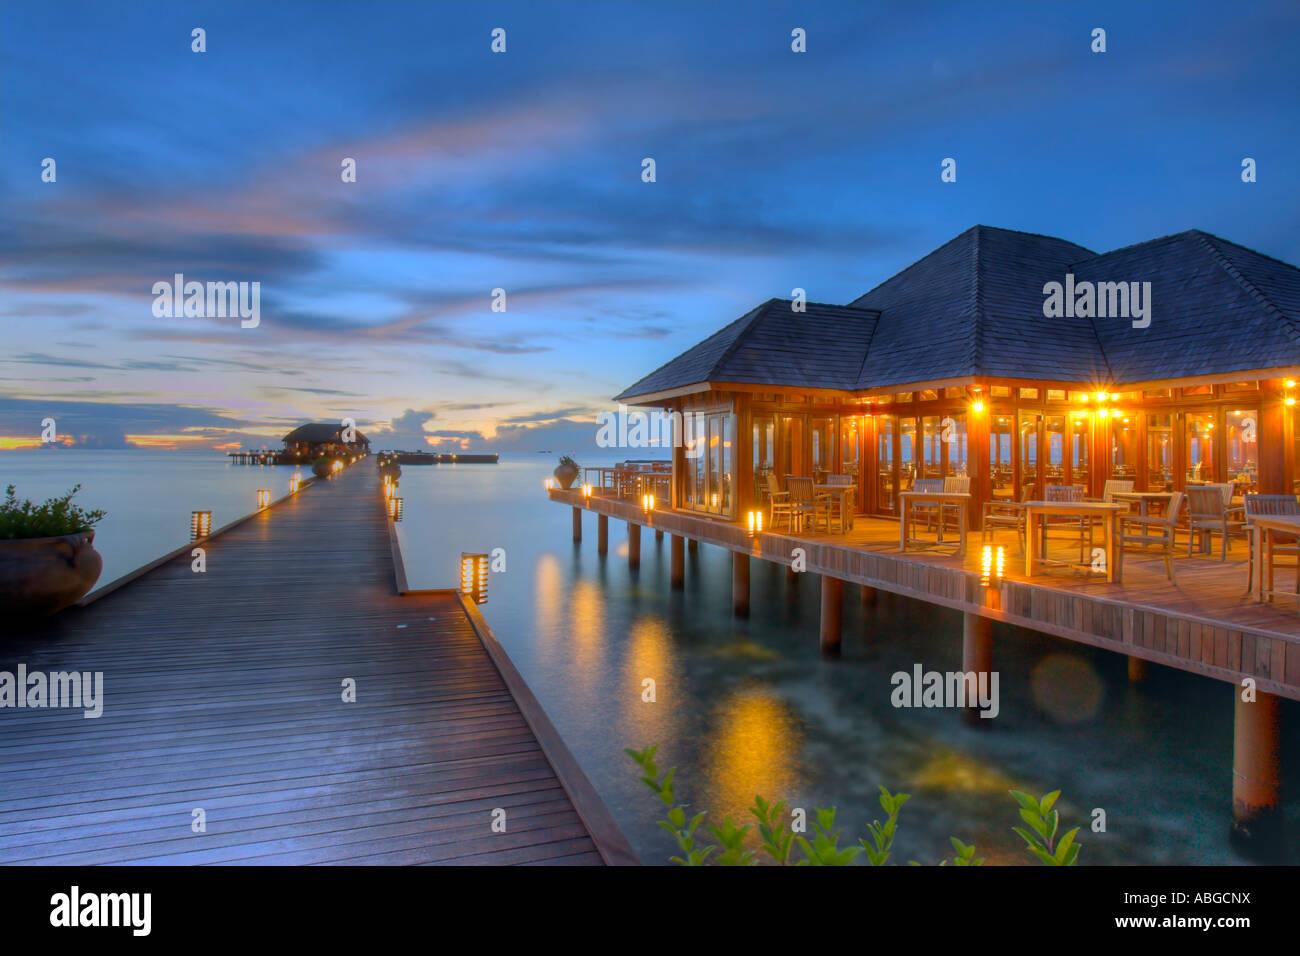 Jetty of Olhuveli in evening light with restaurant, Maledives - Stock Image